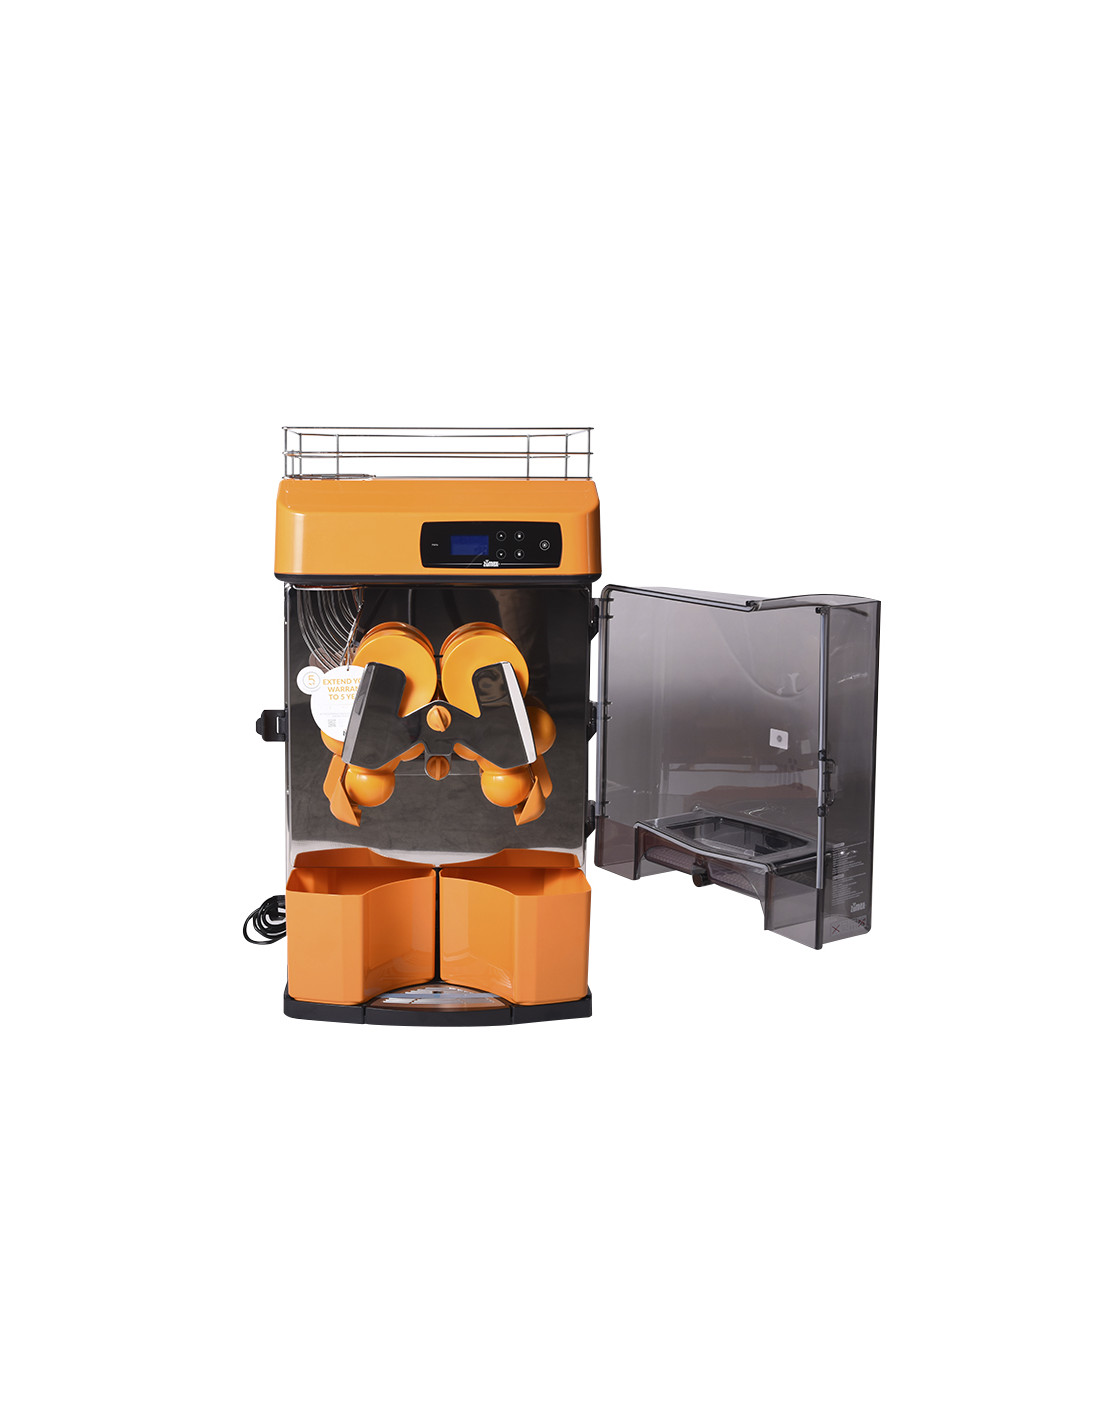 Zumex Versatile Pro Automatic Orange Citrus Juicer Juicers